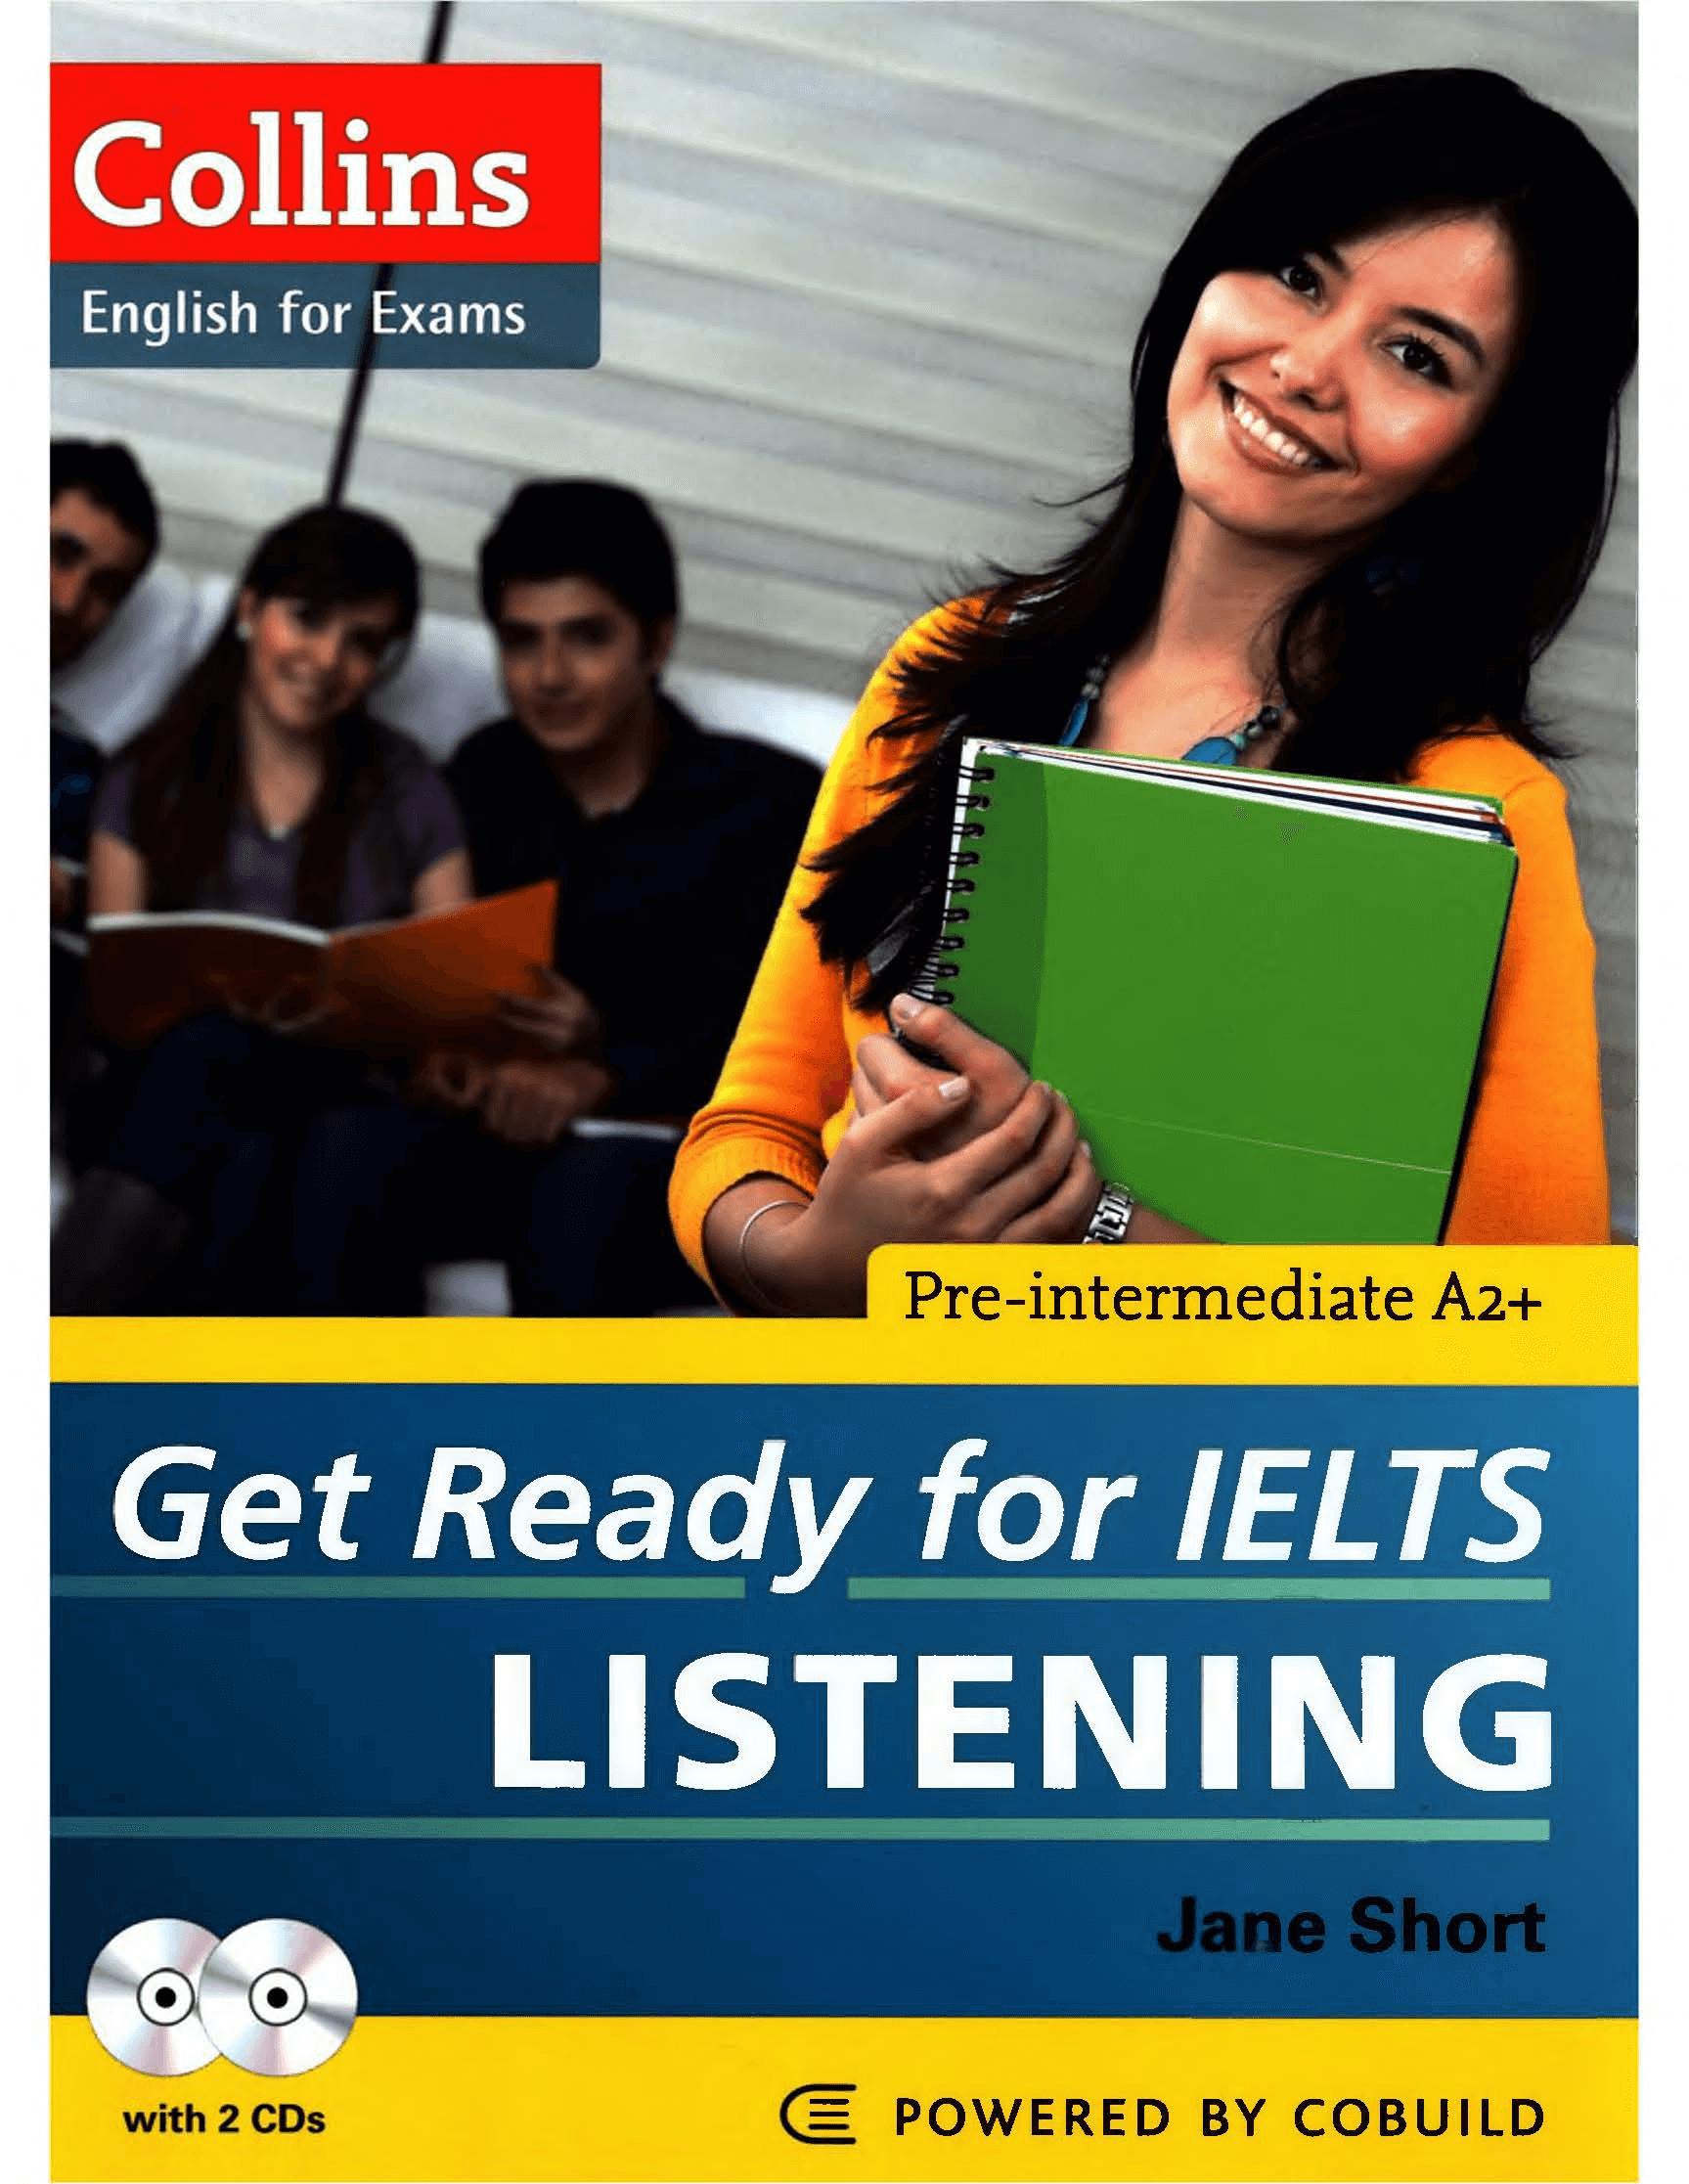 Get ready for IELTS listening - Prepare for IELTS